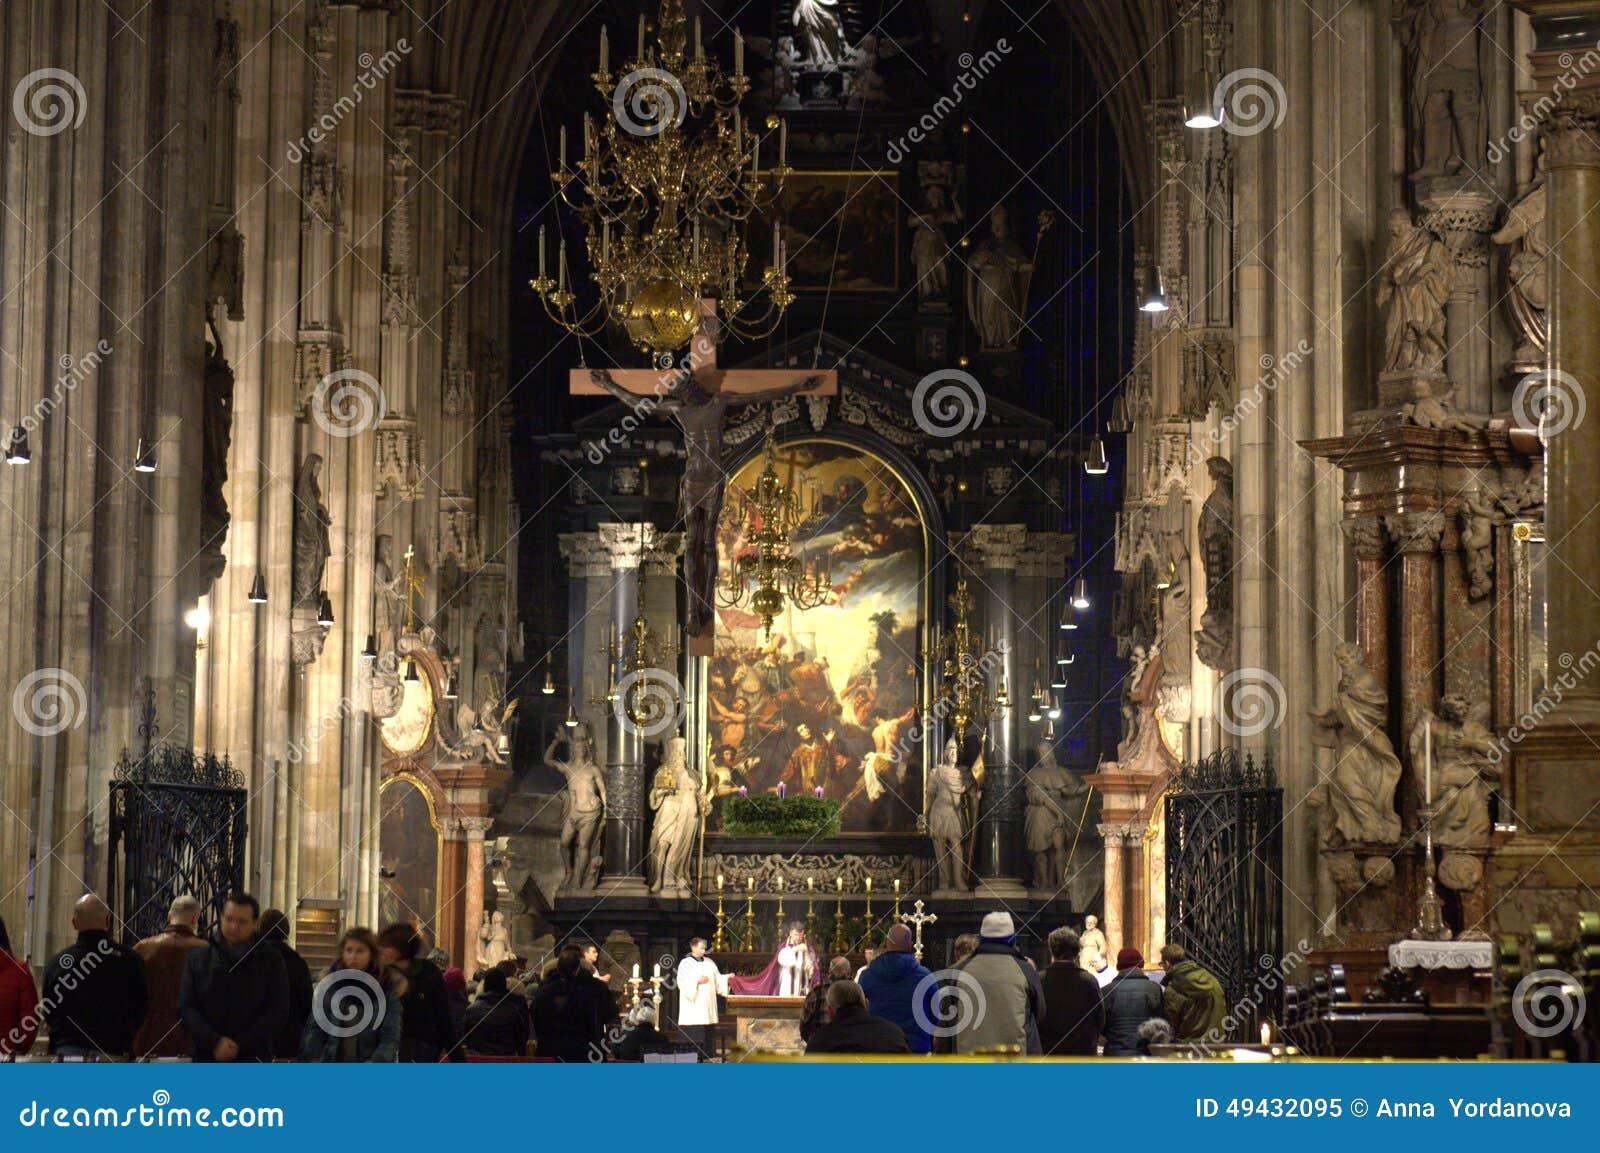 Church service in Stephansdom Vienna,Austria